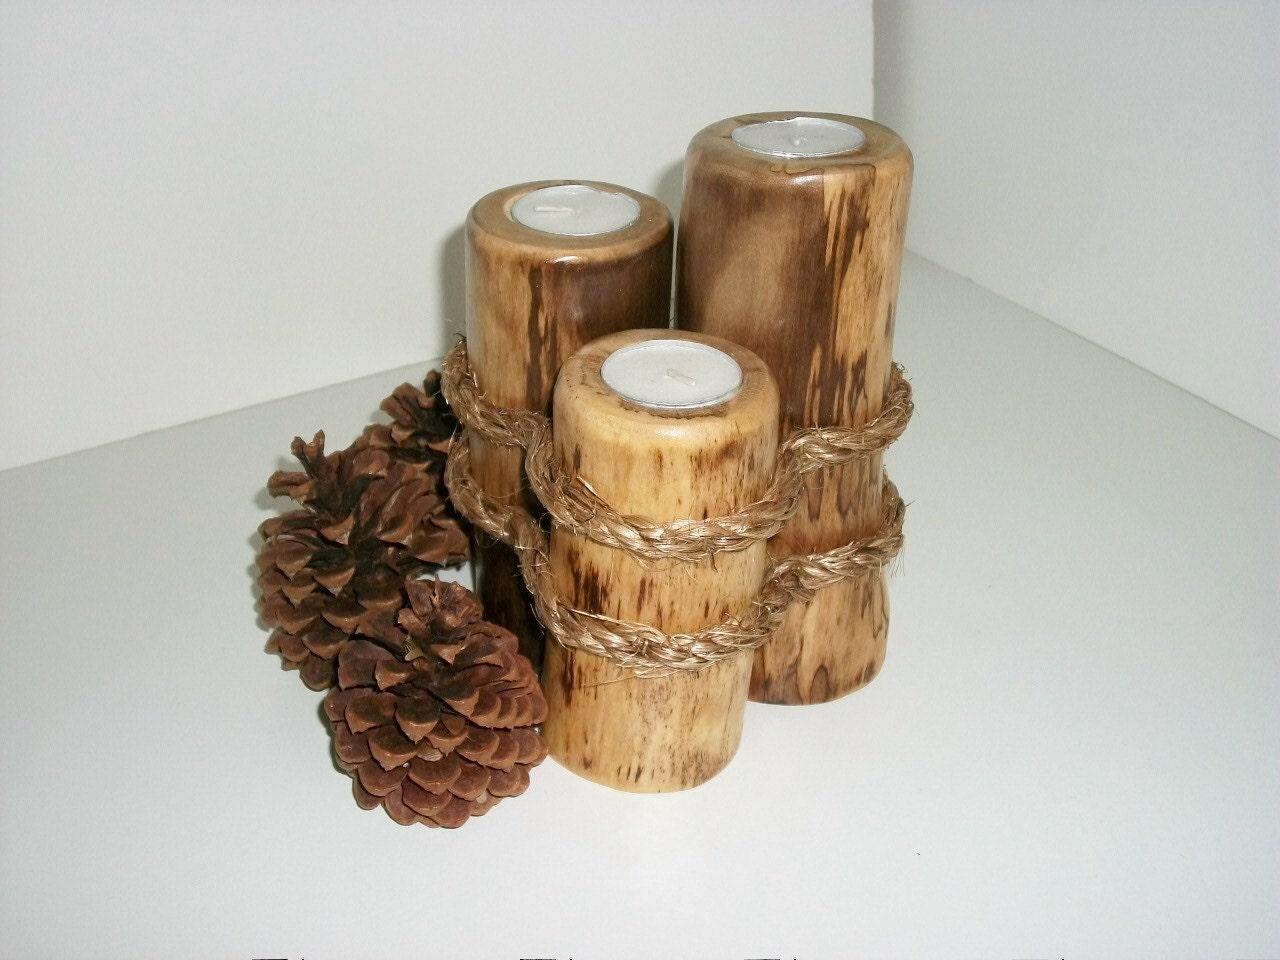 Log candle holder aspen alaskan tea light candleholder three for Log candle holder how to make